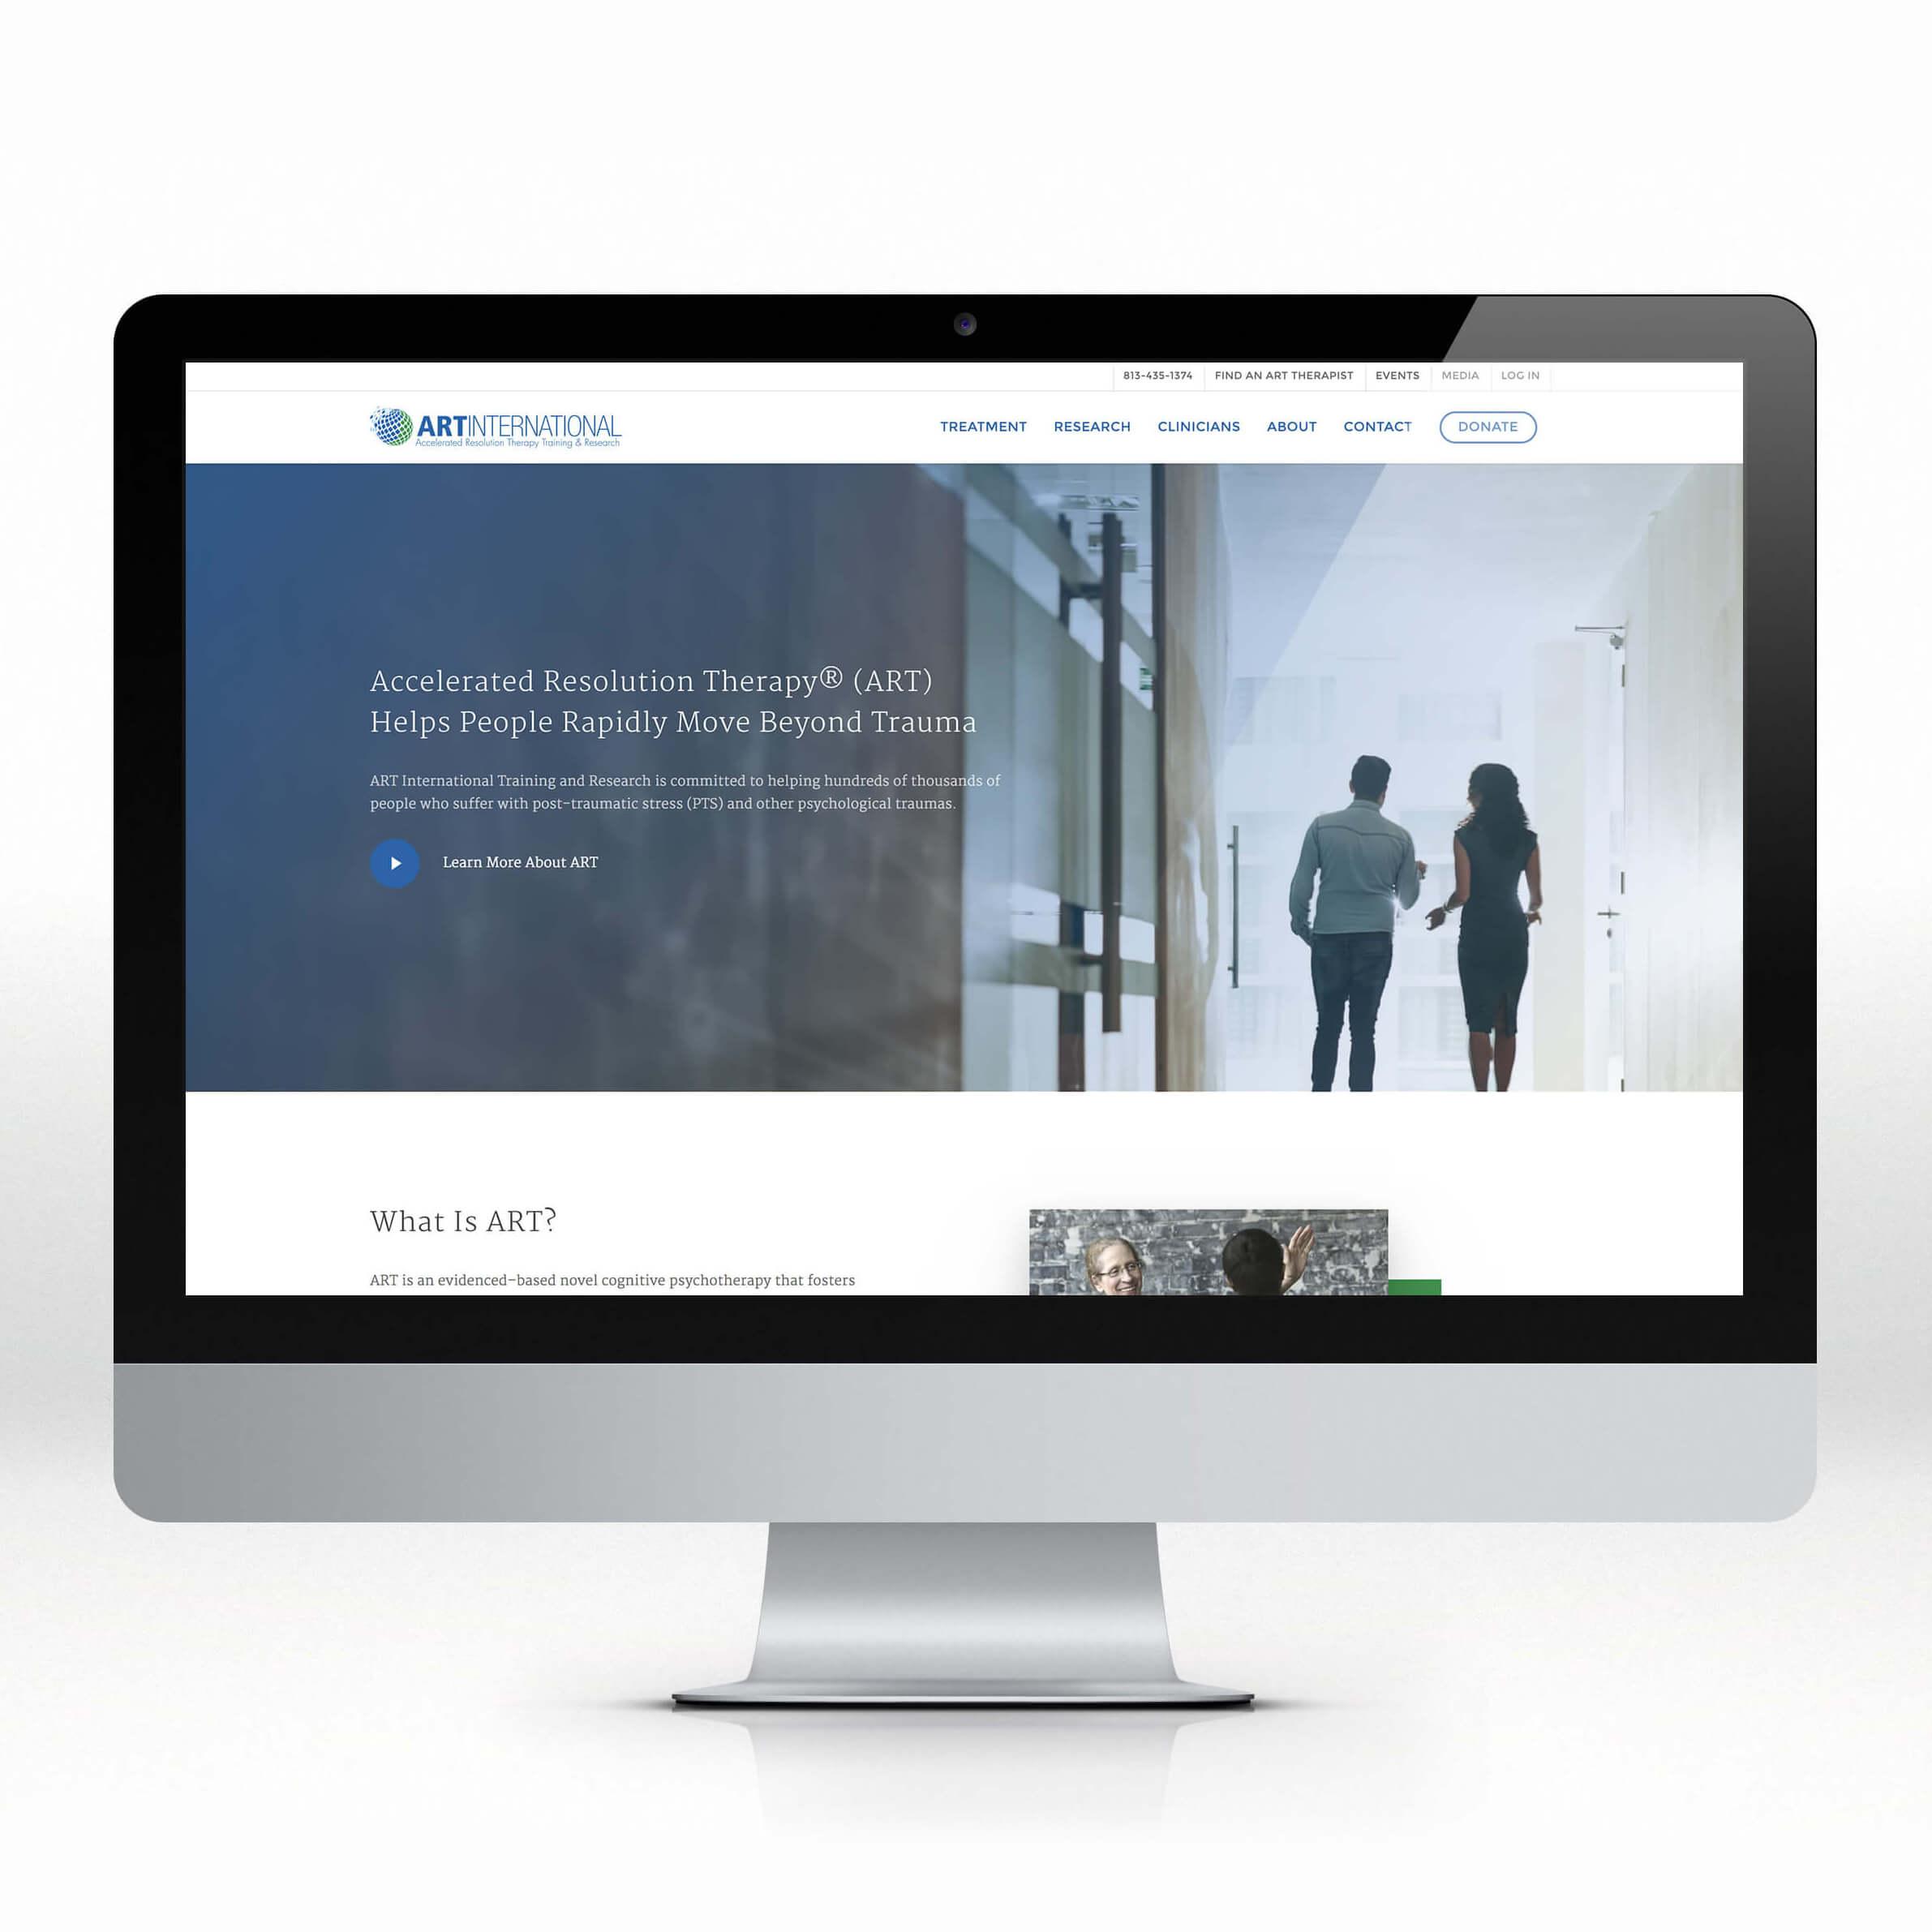 ART International website creative direction by smith design house